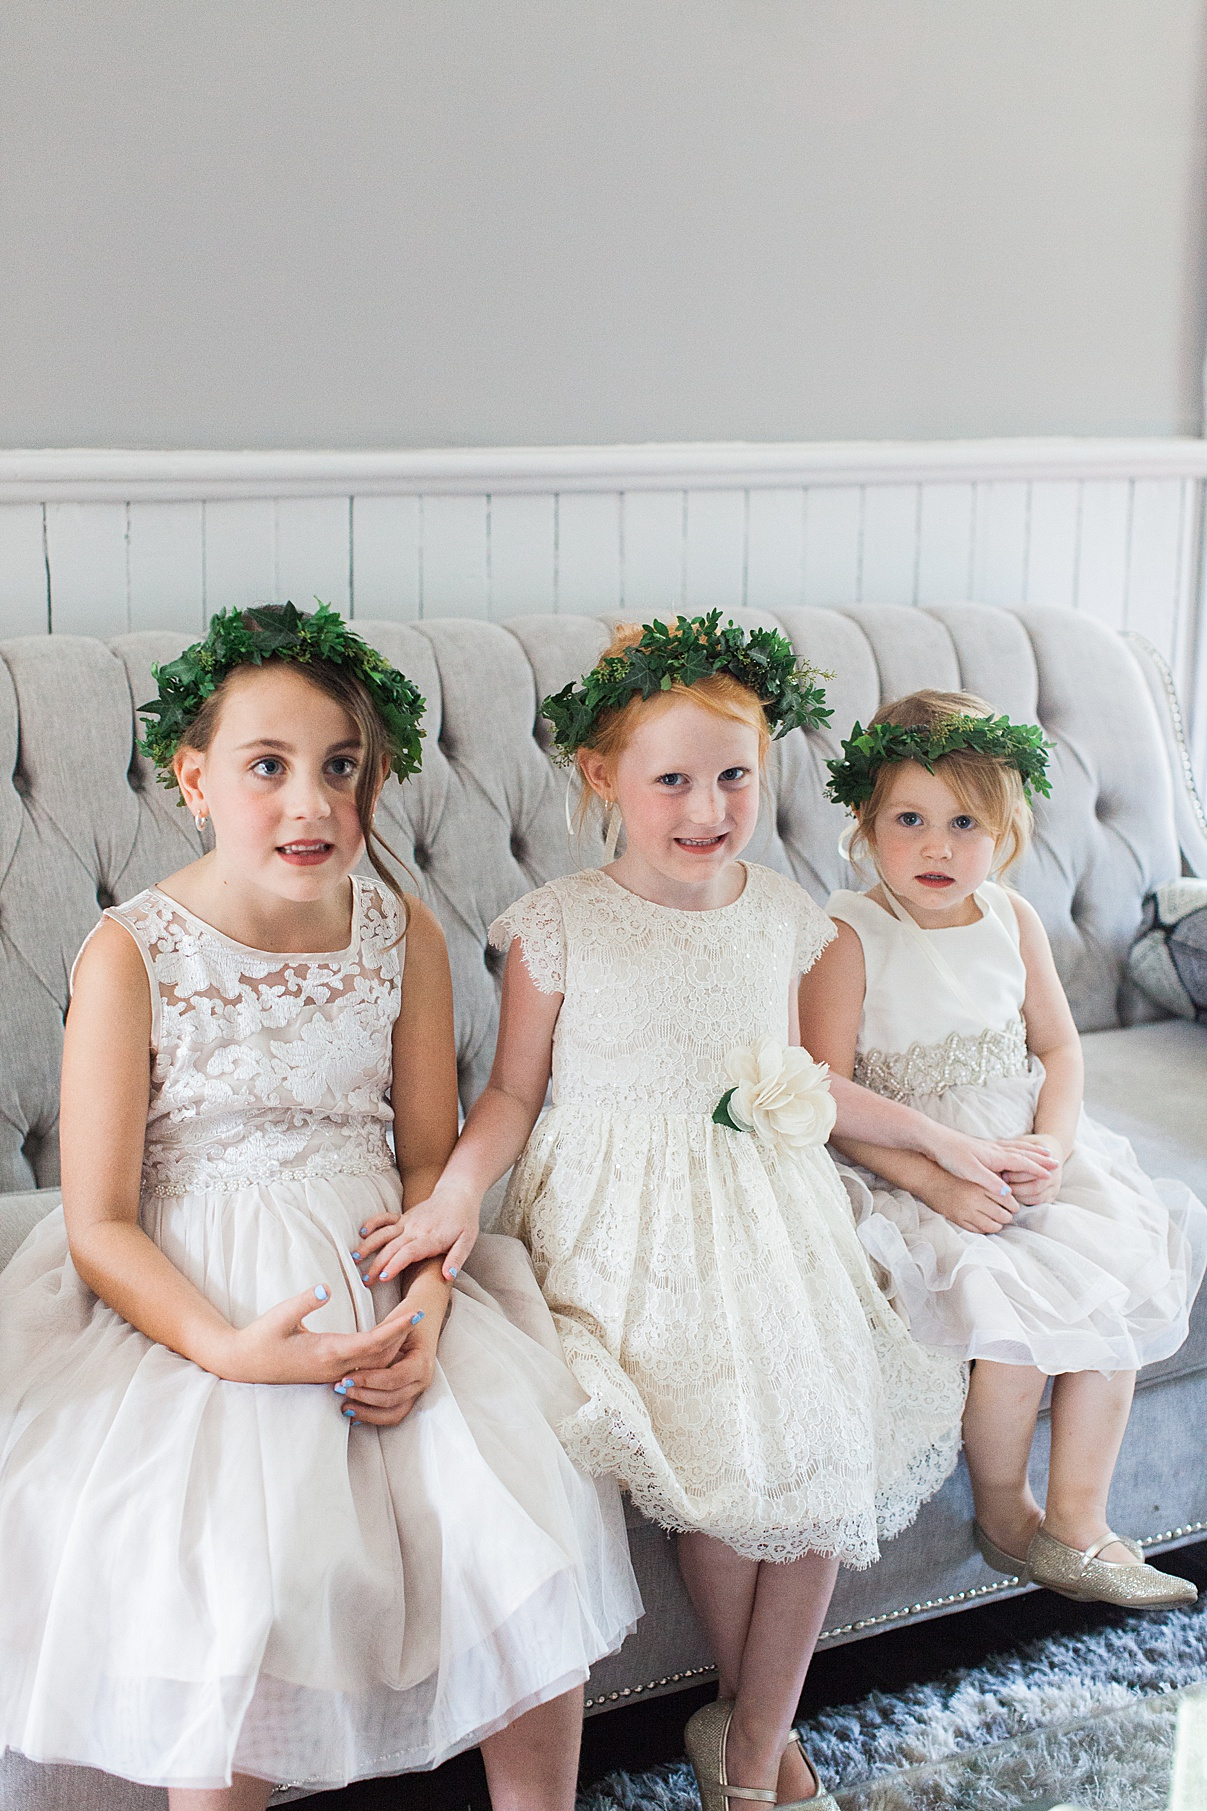 Flower girls smiling on couch | Balls Falls, Ontario Wedding| Ontario Wedding Photographer| Toronto Wedding Photographer| 3Photography|3photography.ca